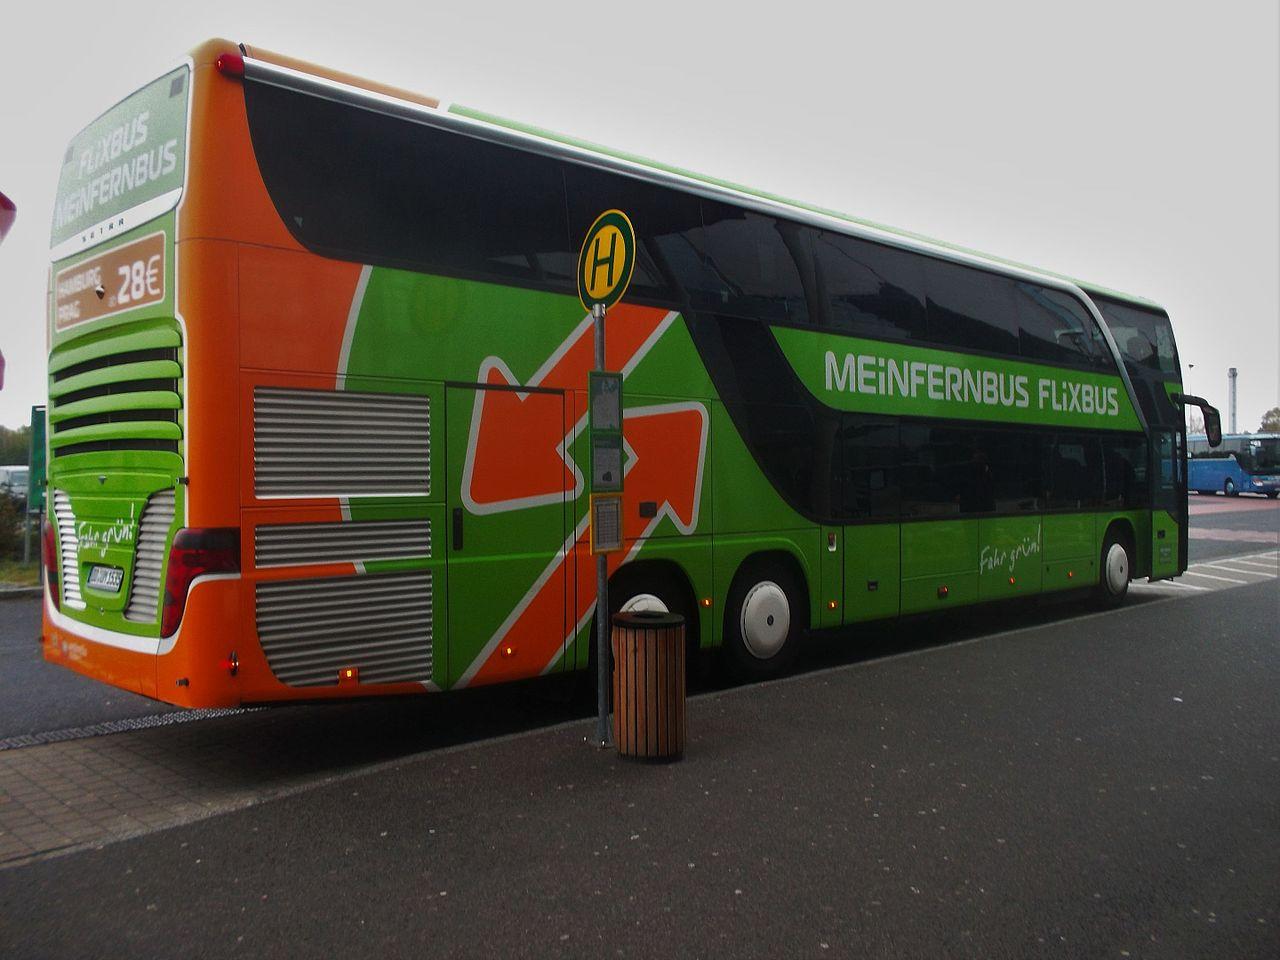 Meinfernbusflixbus